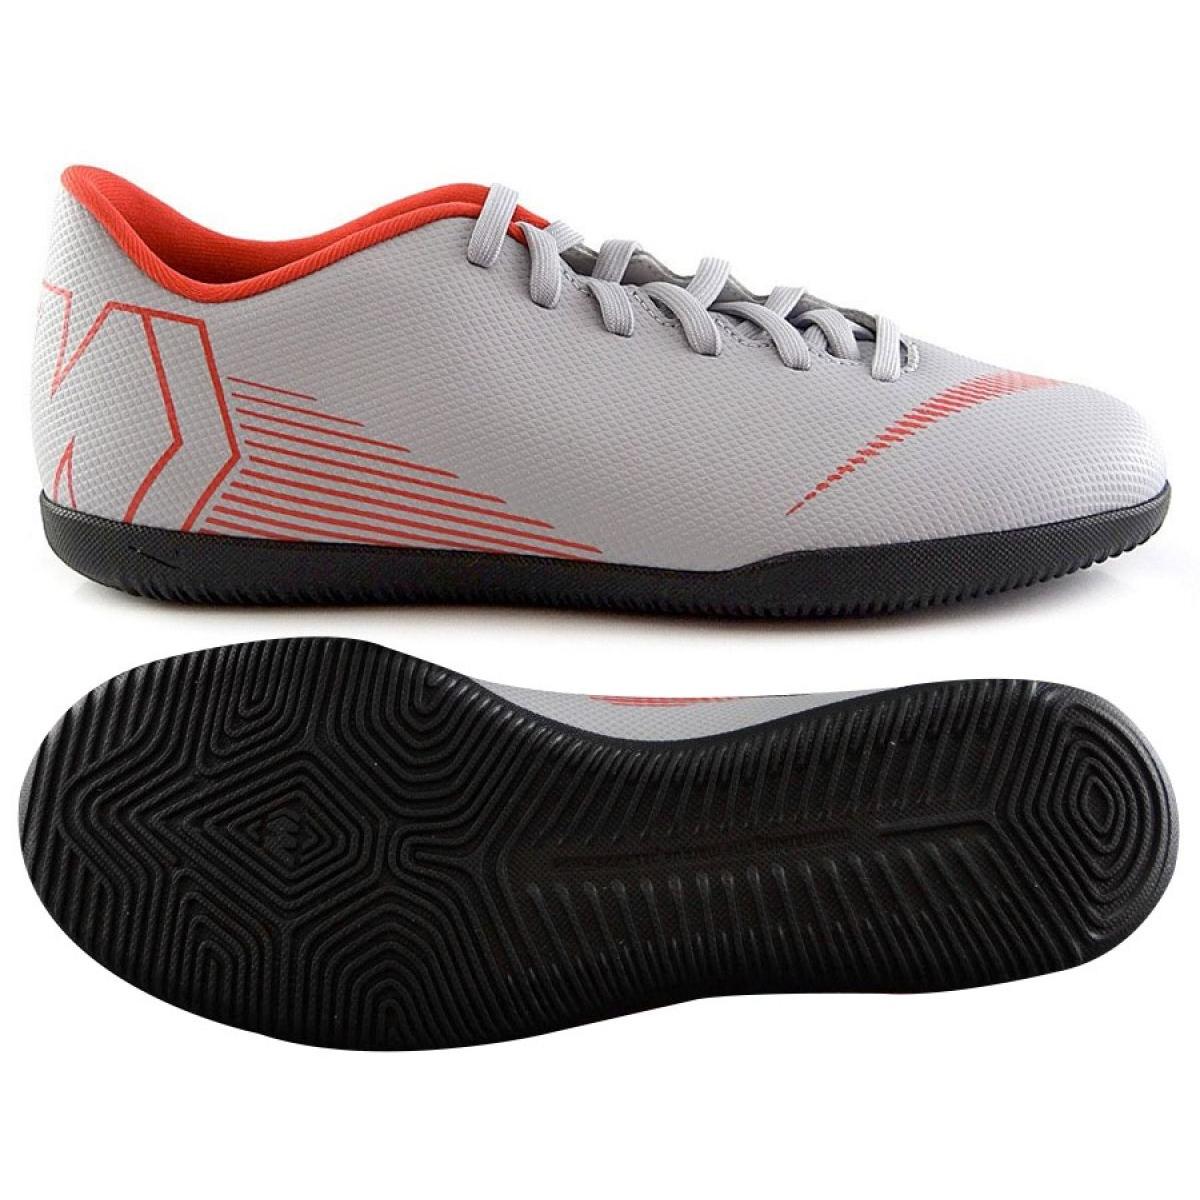 separation shoes b64c9 51765 Hallenschuhe Nike Mercurial Vapor 12 Club Ic M AH7385-060